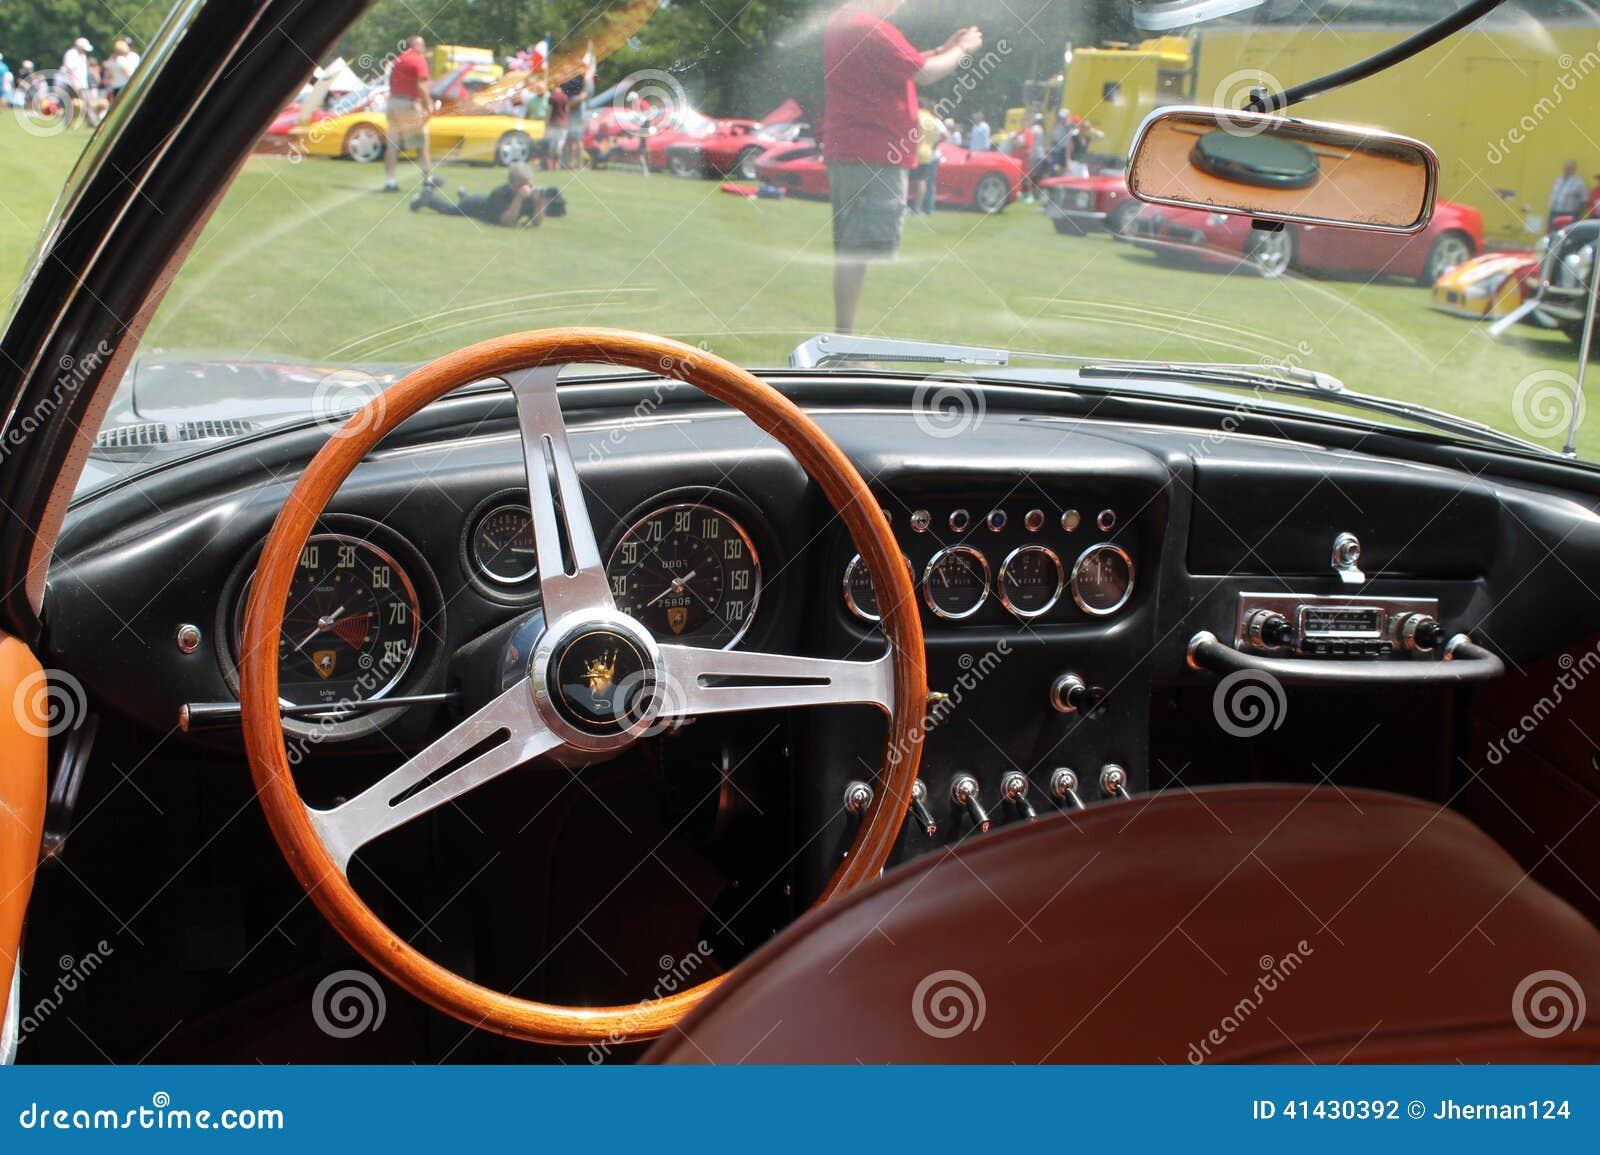 old sports car cockpit editorial photography image 41430392. Black Bedroom Furniture Sets. Home Design Ideas